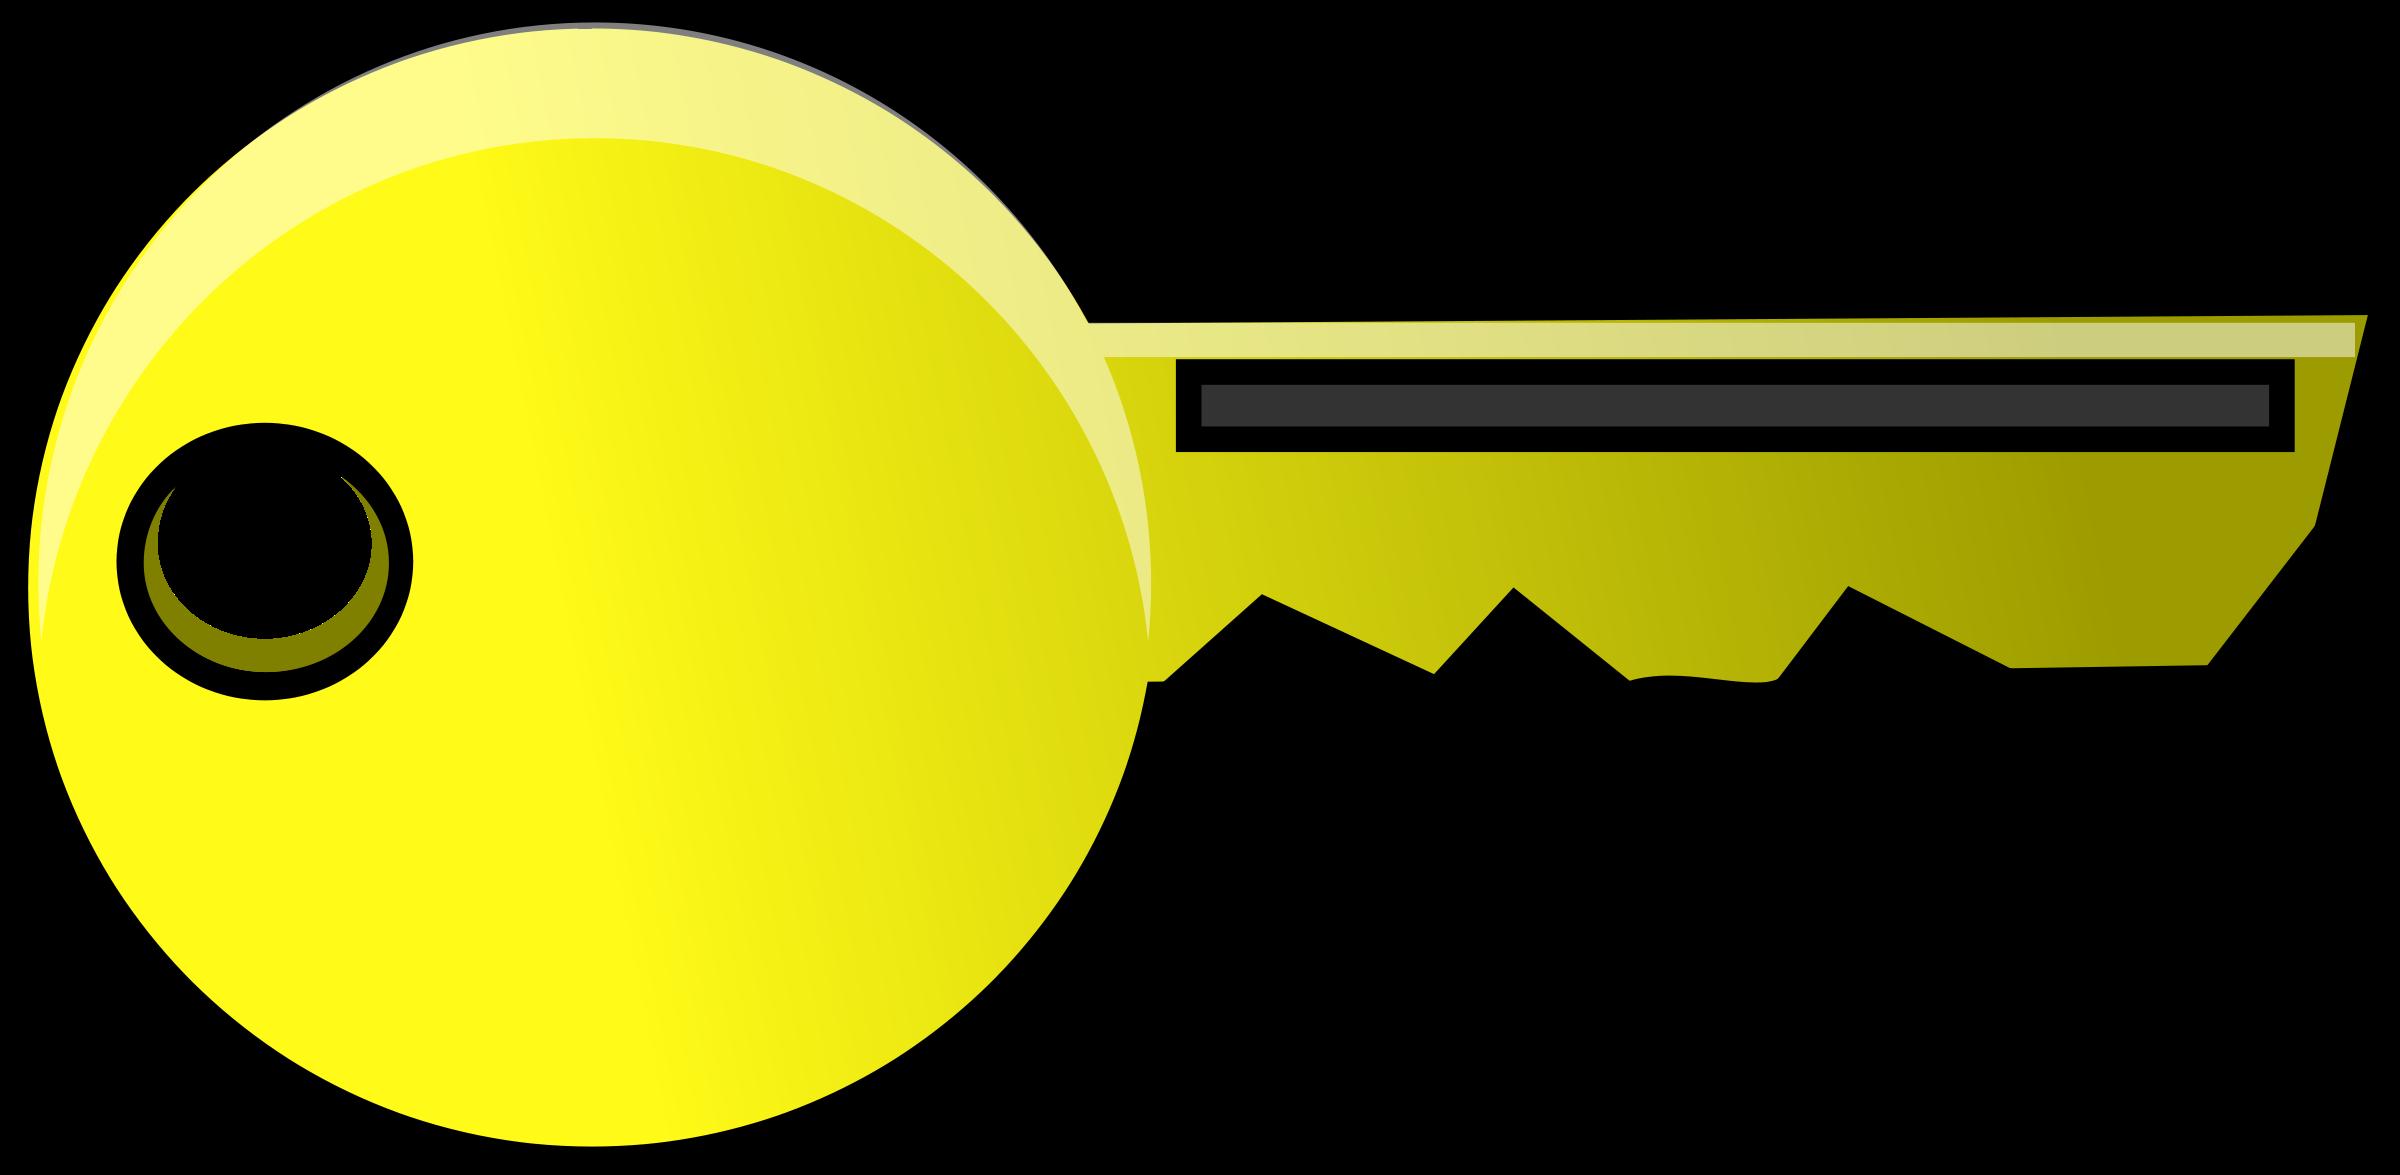 Key clipart svg stock Free Keys Cliparts, Download Free Clip Art, Free Clip Art on Clipart ... svg stock